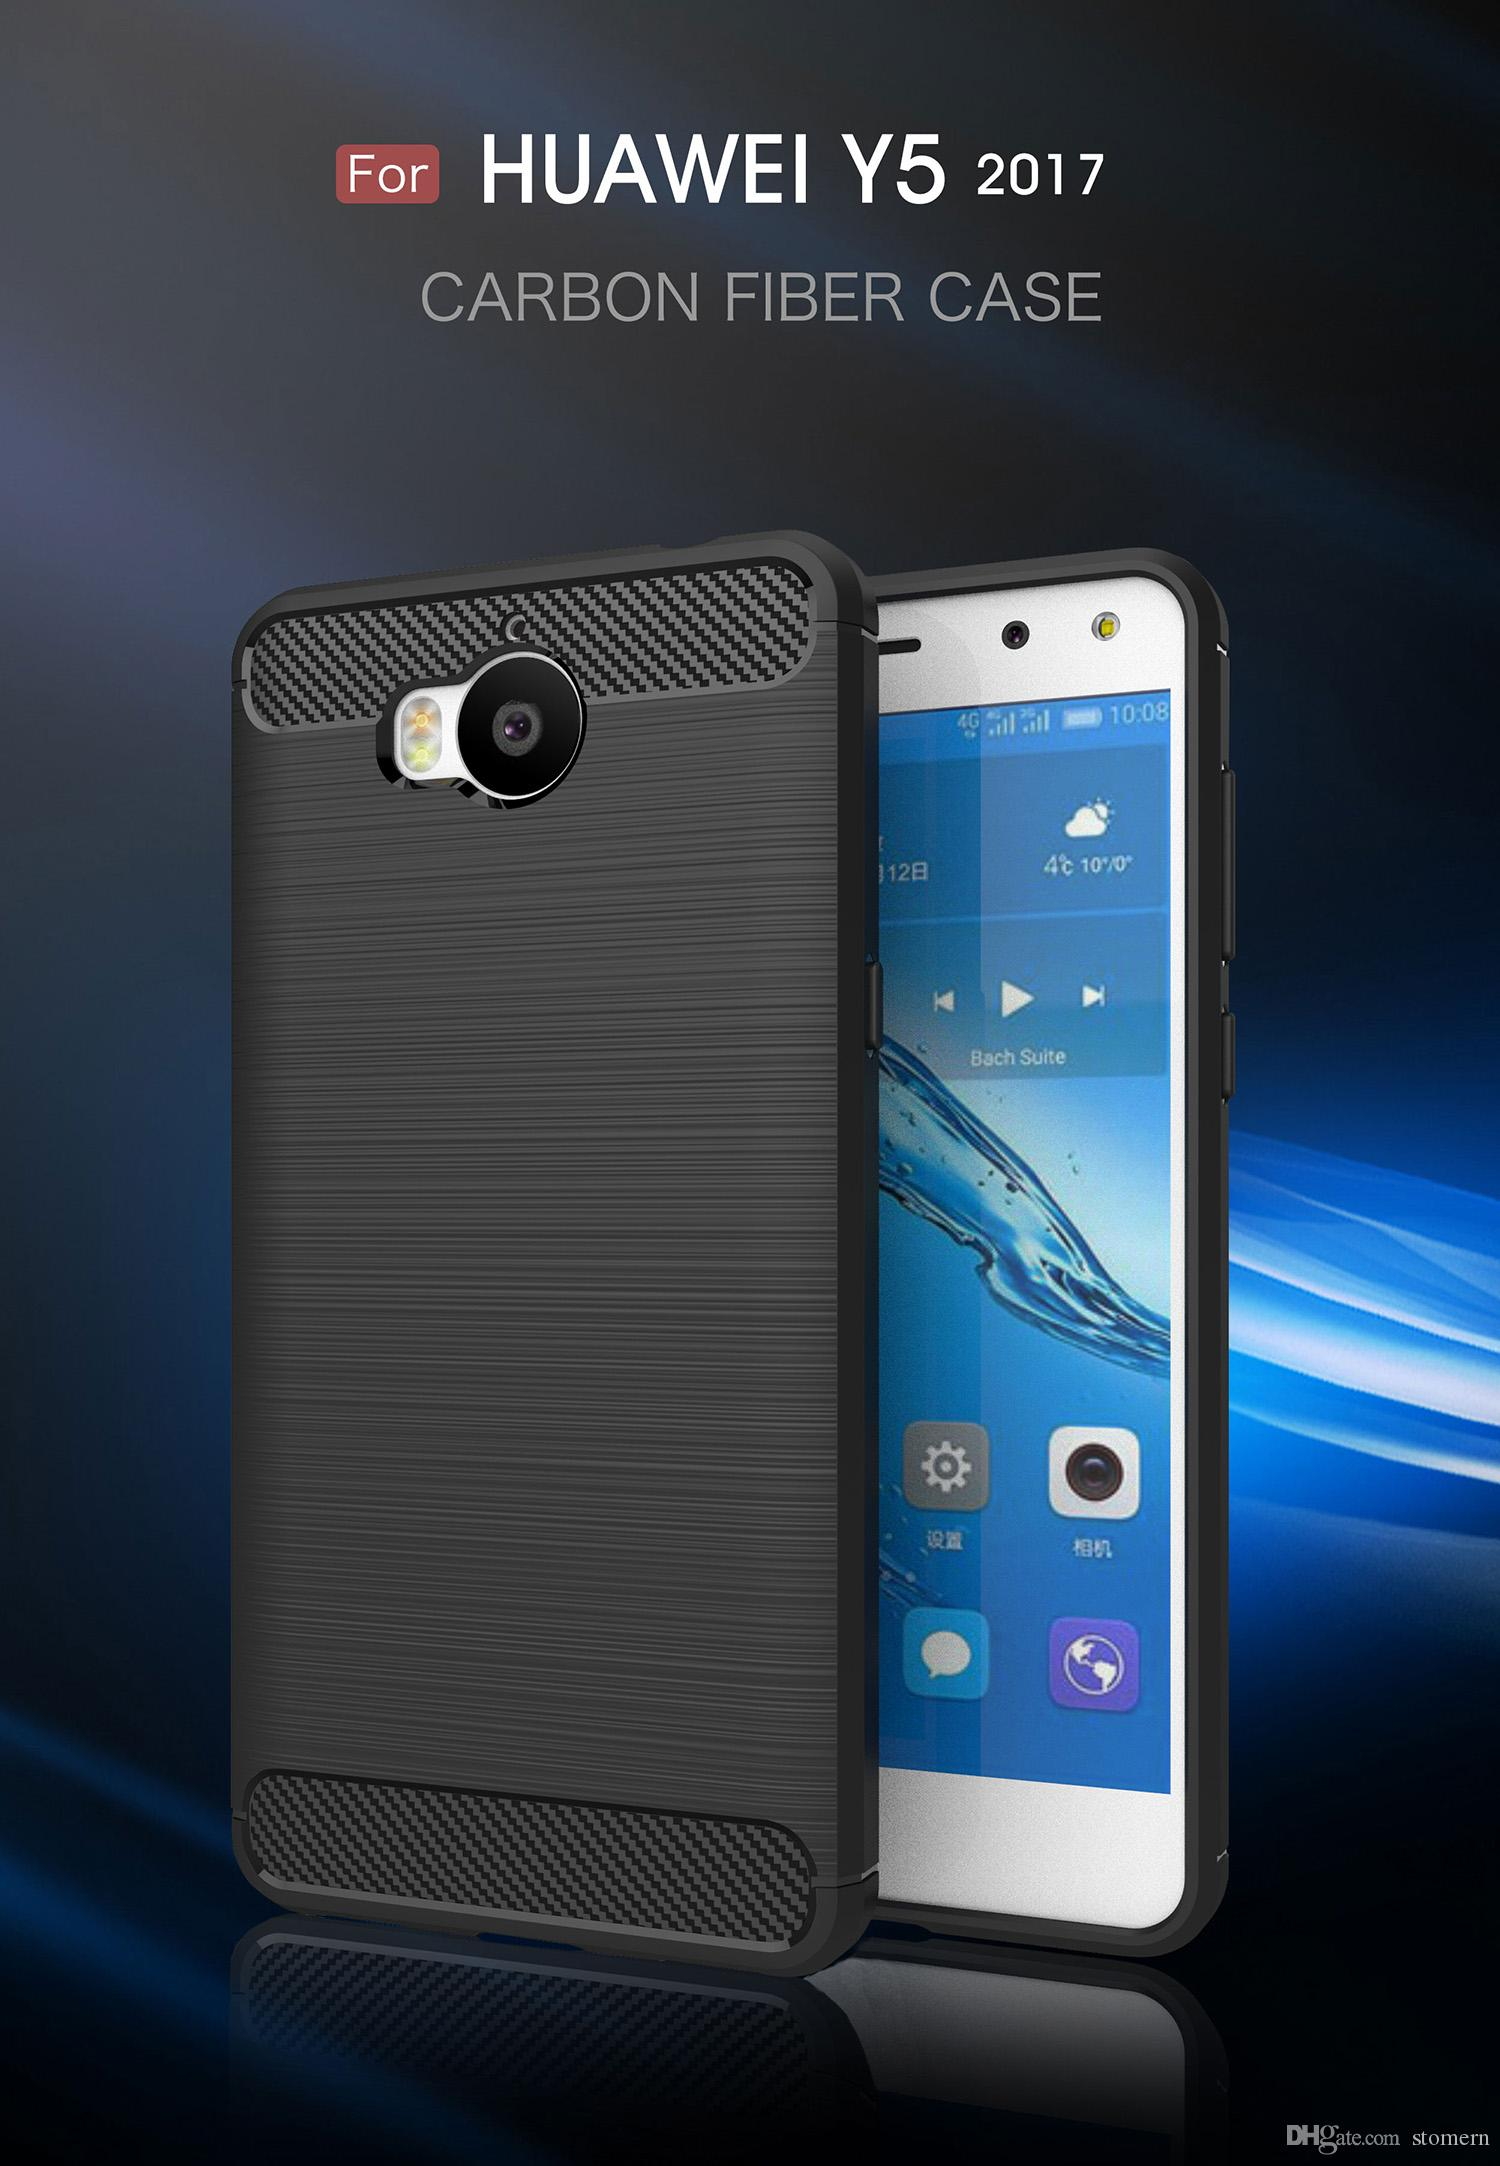 Carbon Fiber Case For Huawei Y5 2017 P8 Lite Honor 8 Lite P9